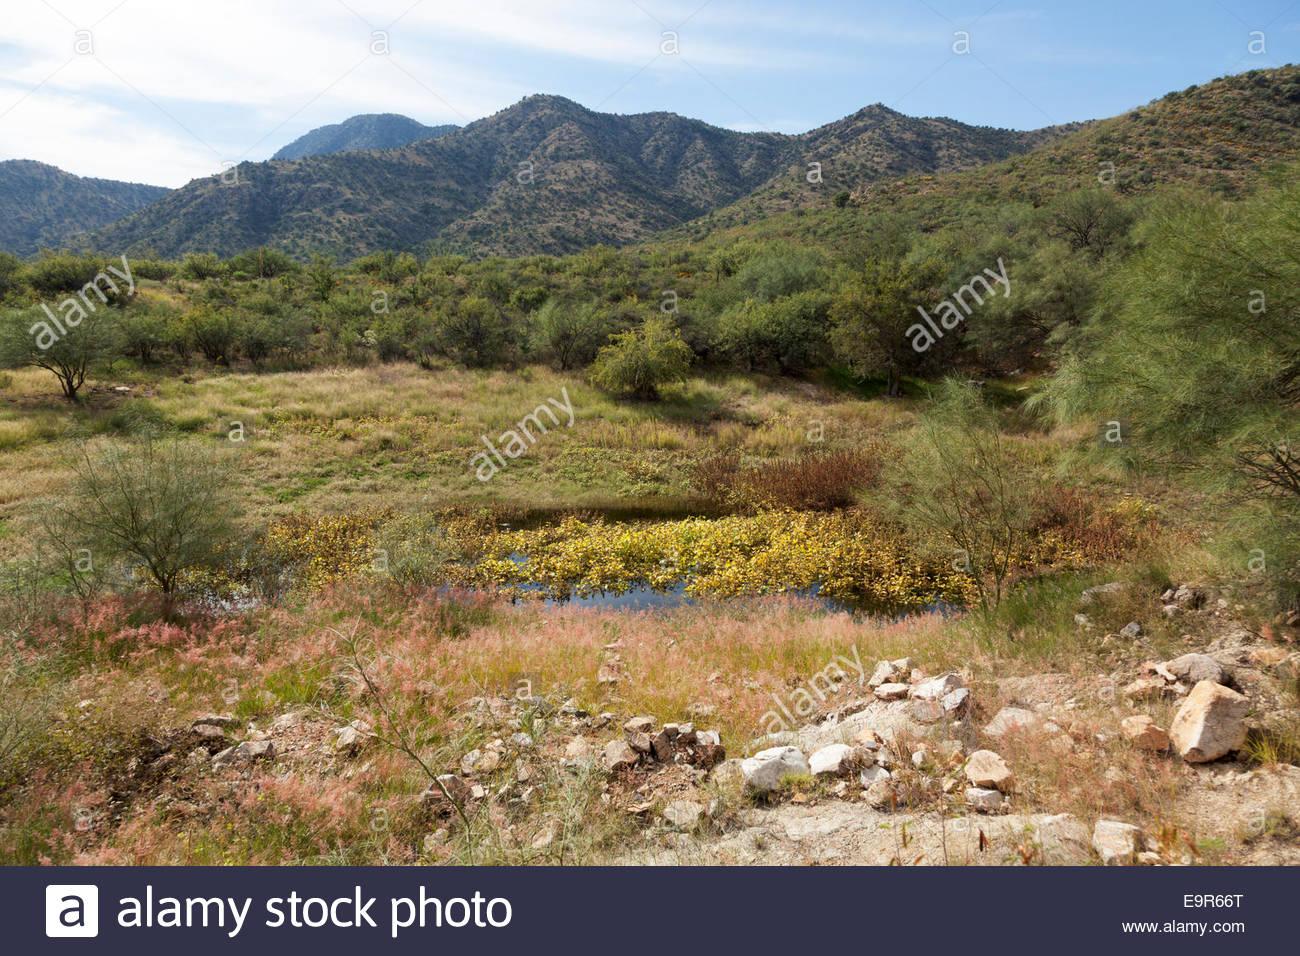 Desert mountains Stock tank watering hole  Arizona - Stock Image